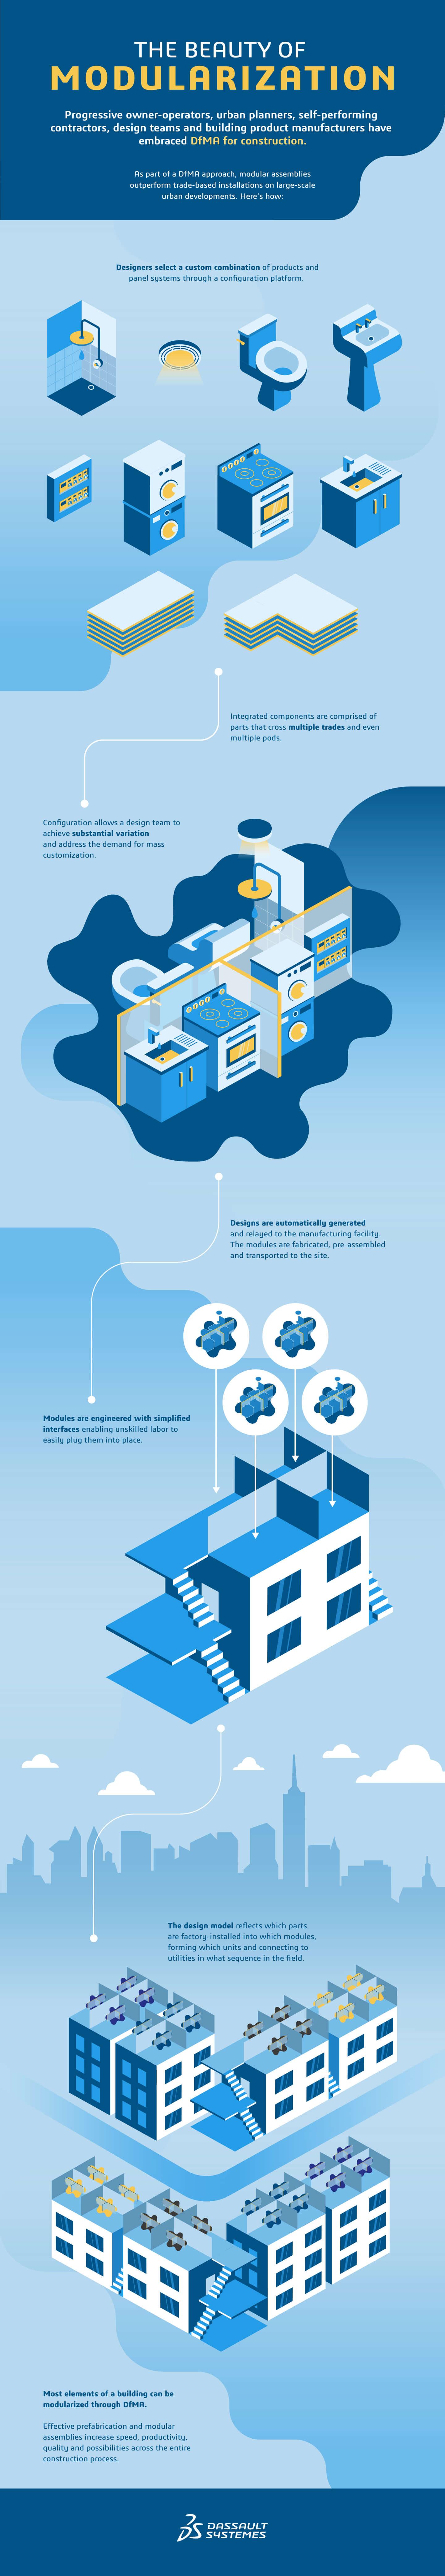 The beauty of modularization Infographic > Desktop version > Dassault Systèmes